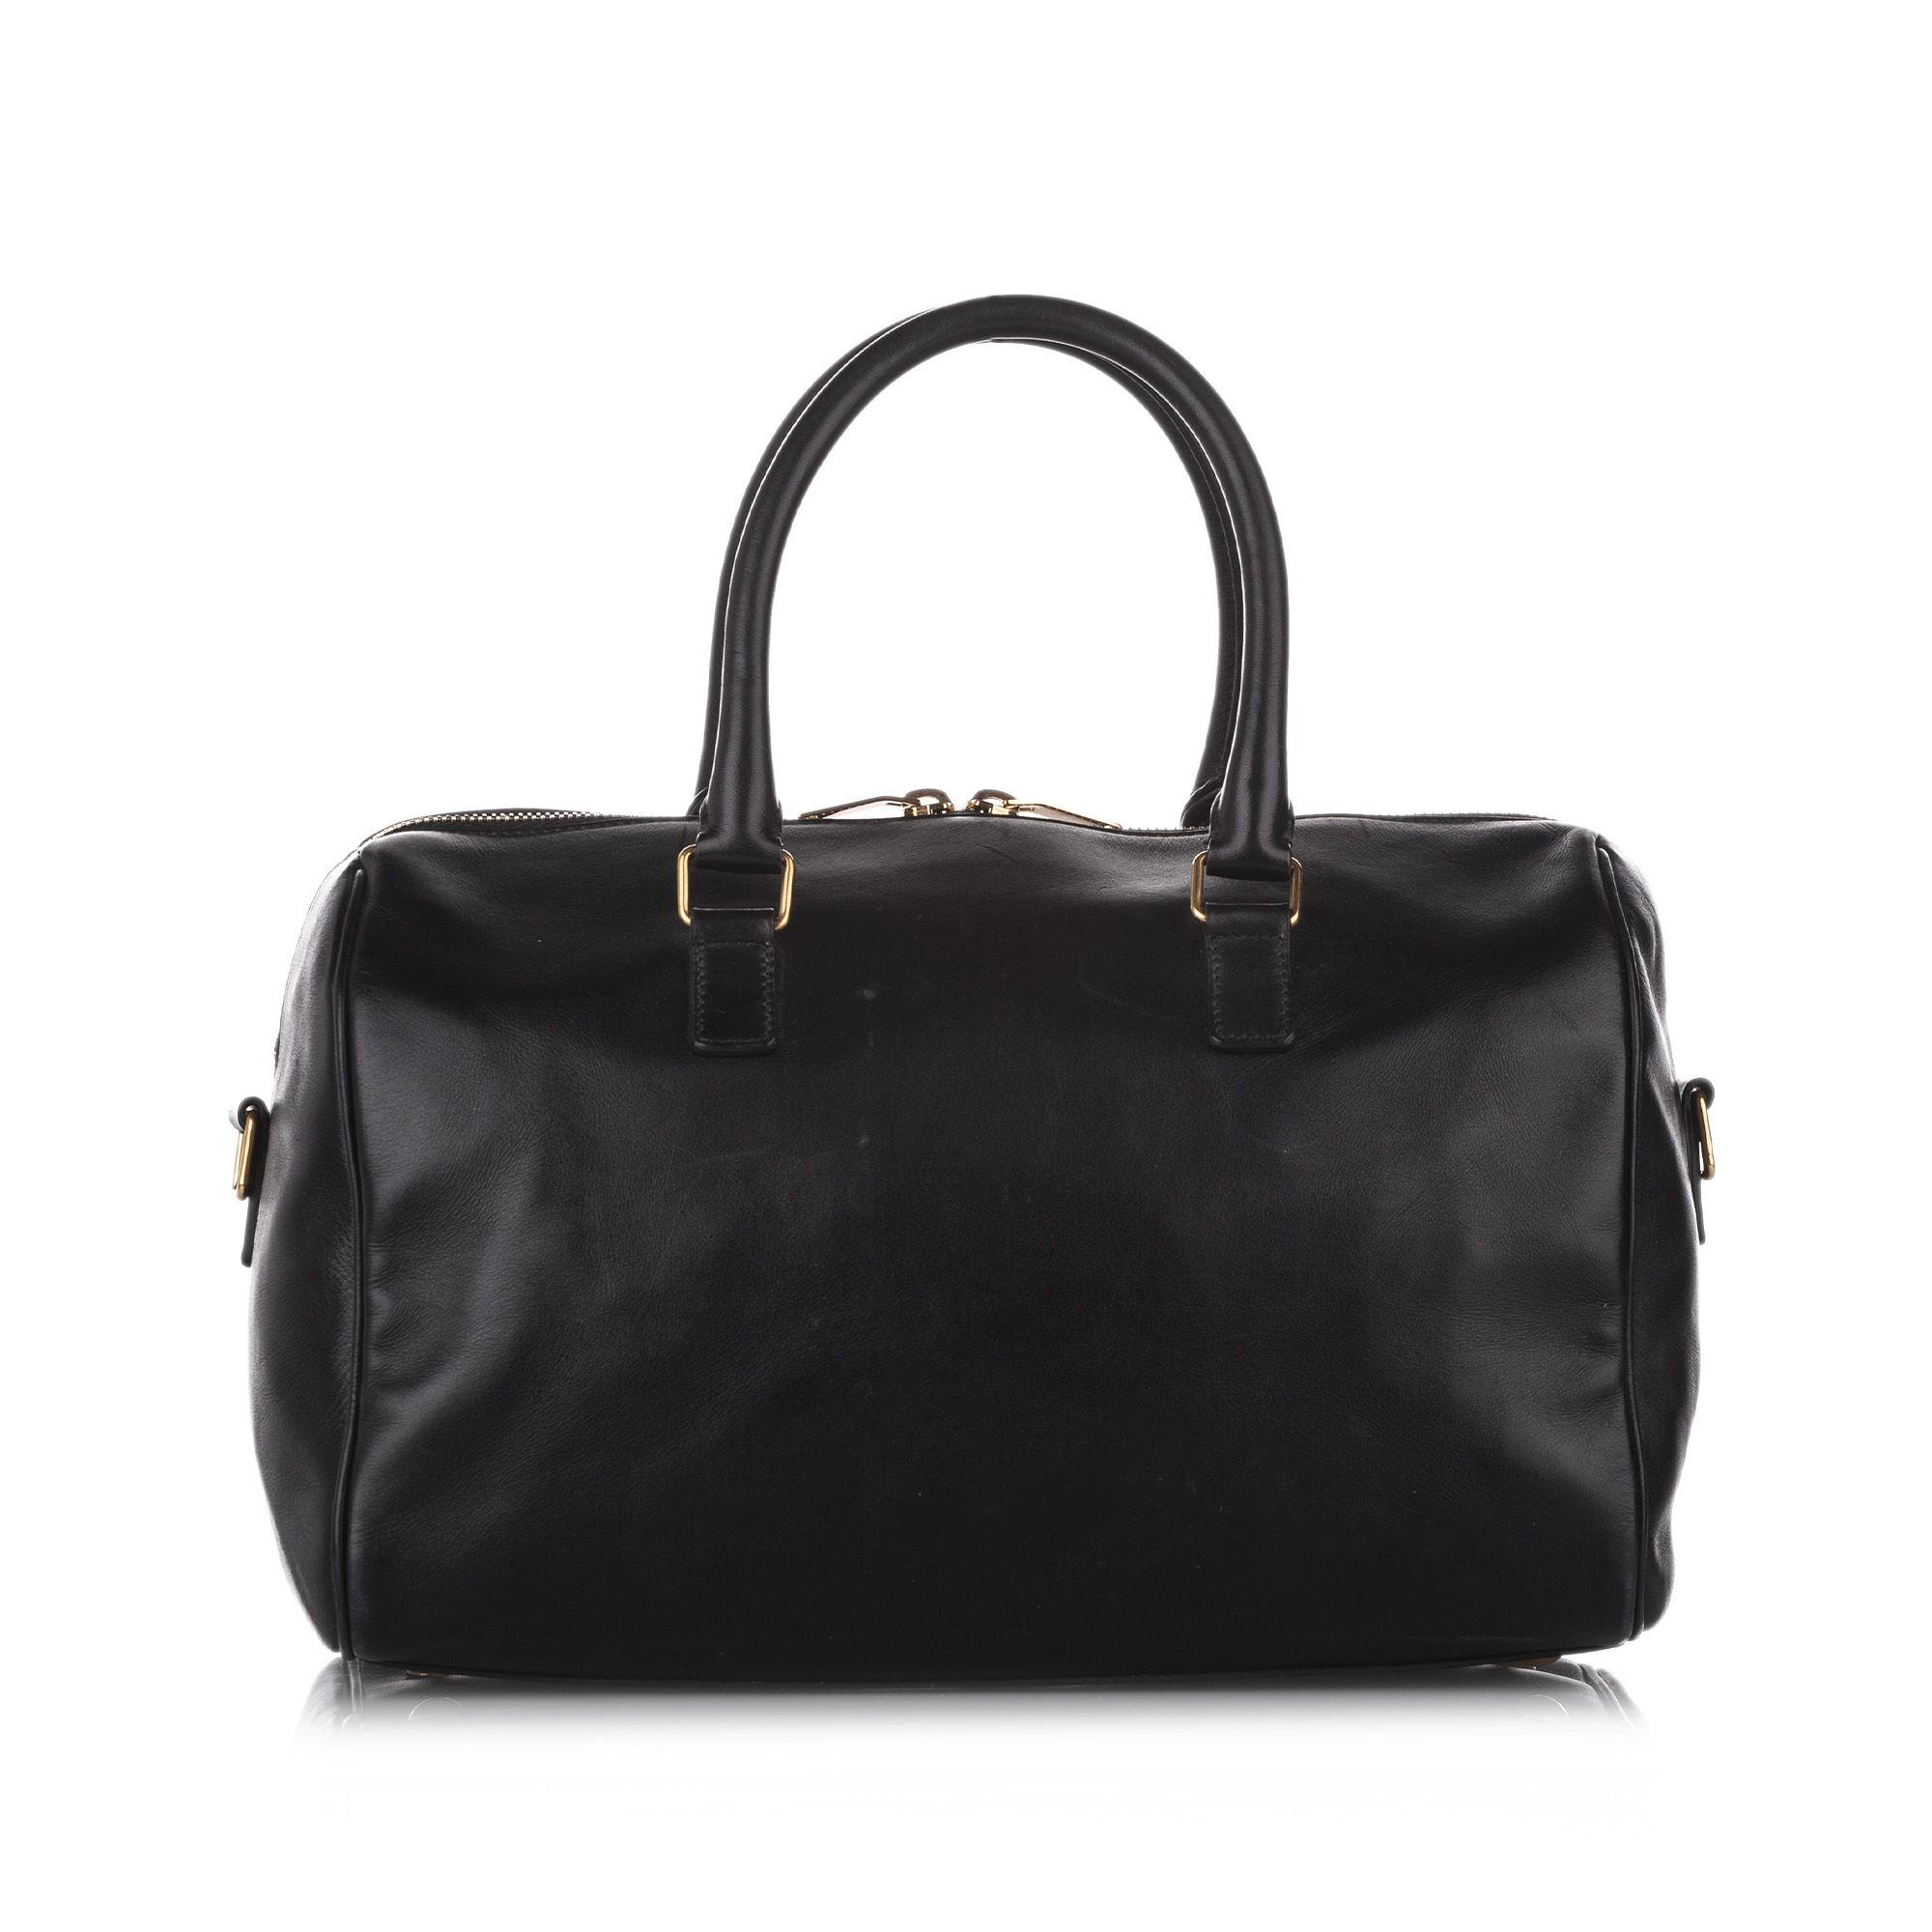 Vintage YSL Classic Duffle 6 Leather Satchel Black